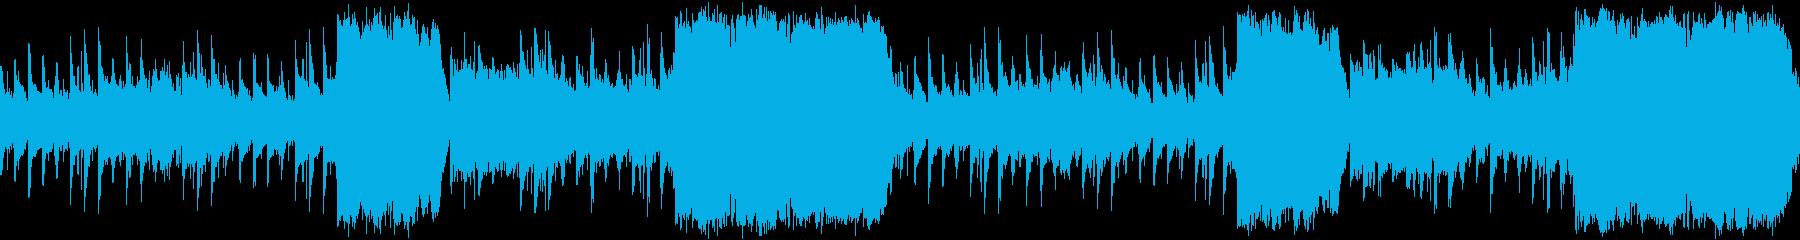 Space Core13の再生済みの波形